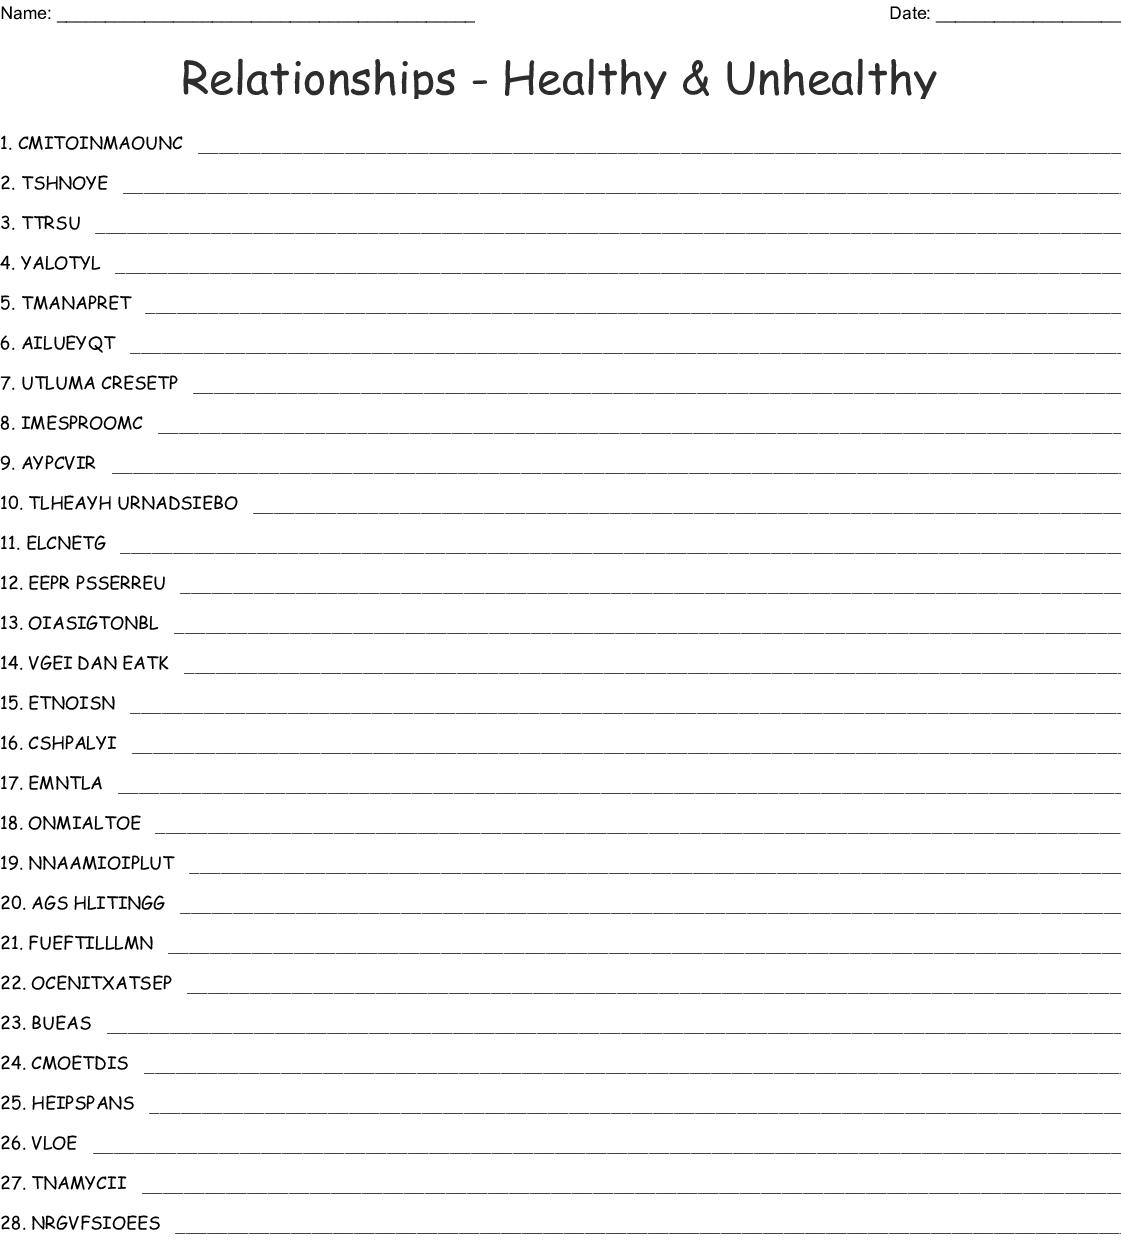 Relationships Healthy Unhealthy Word Scramble Wordmint